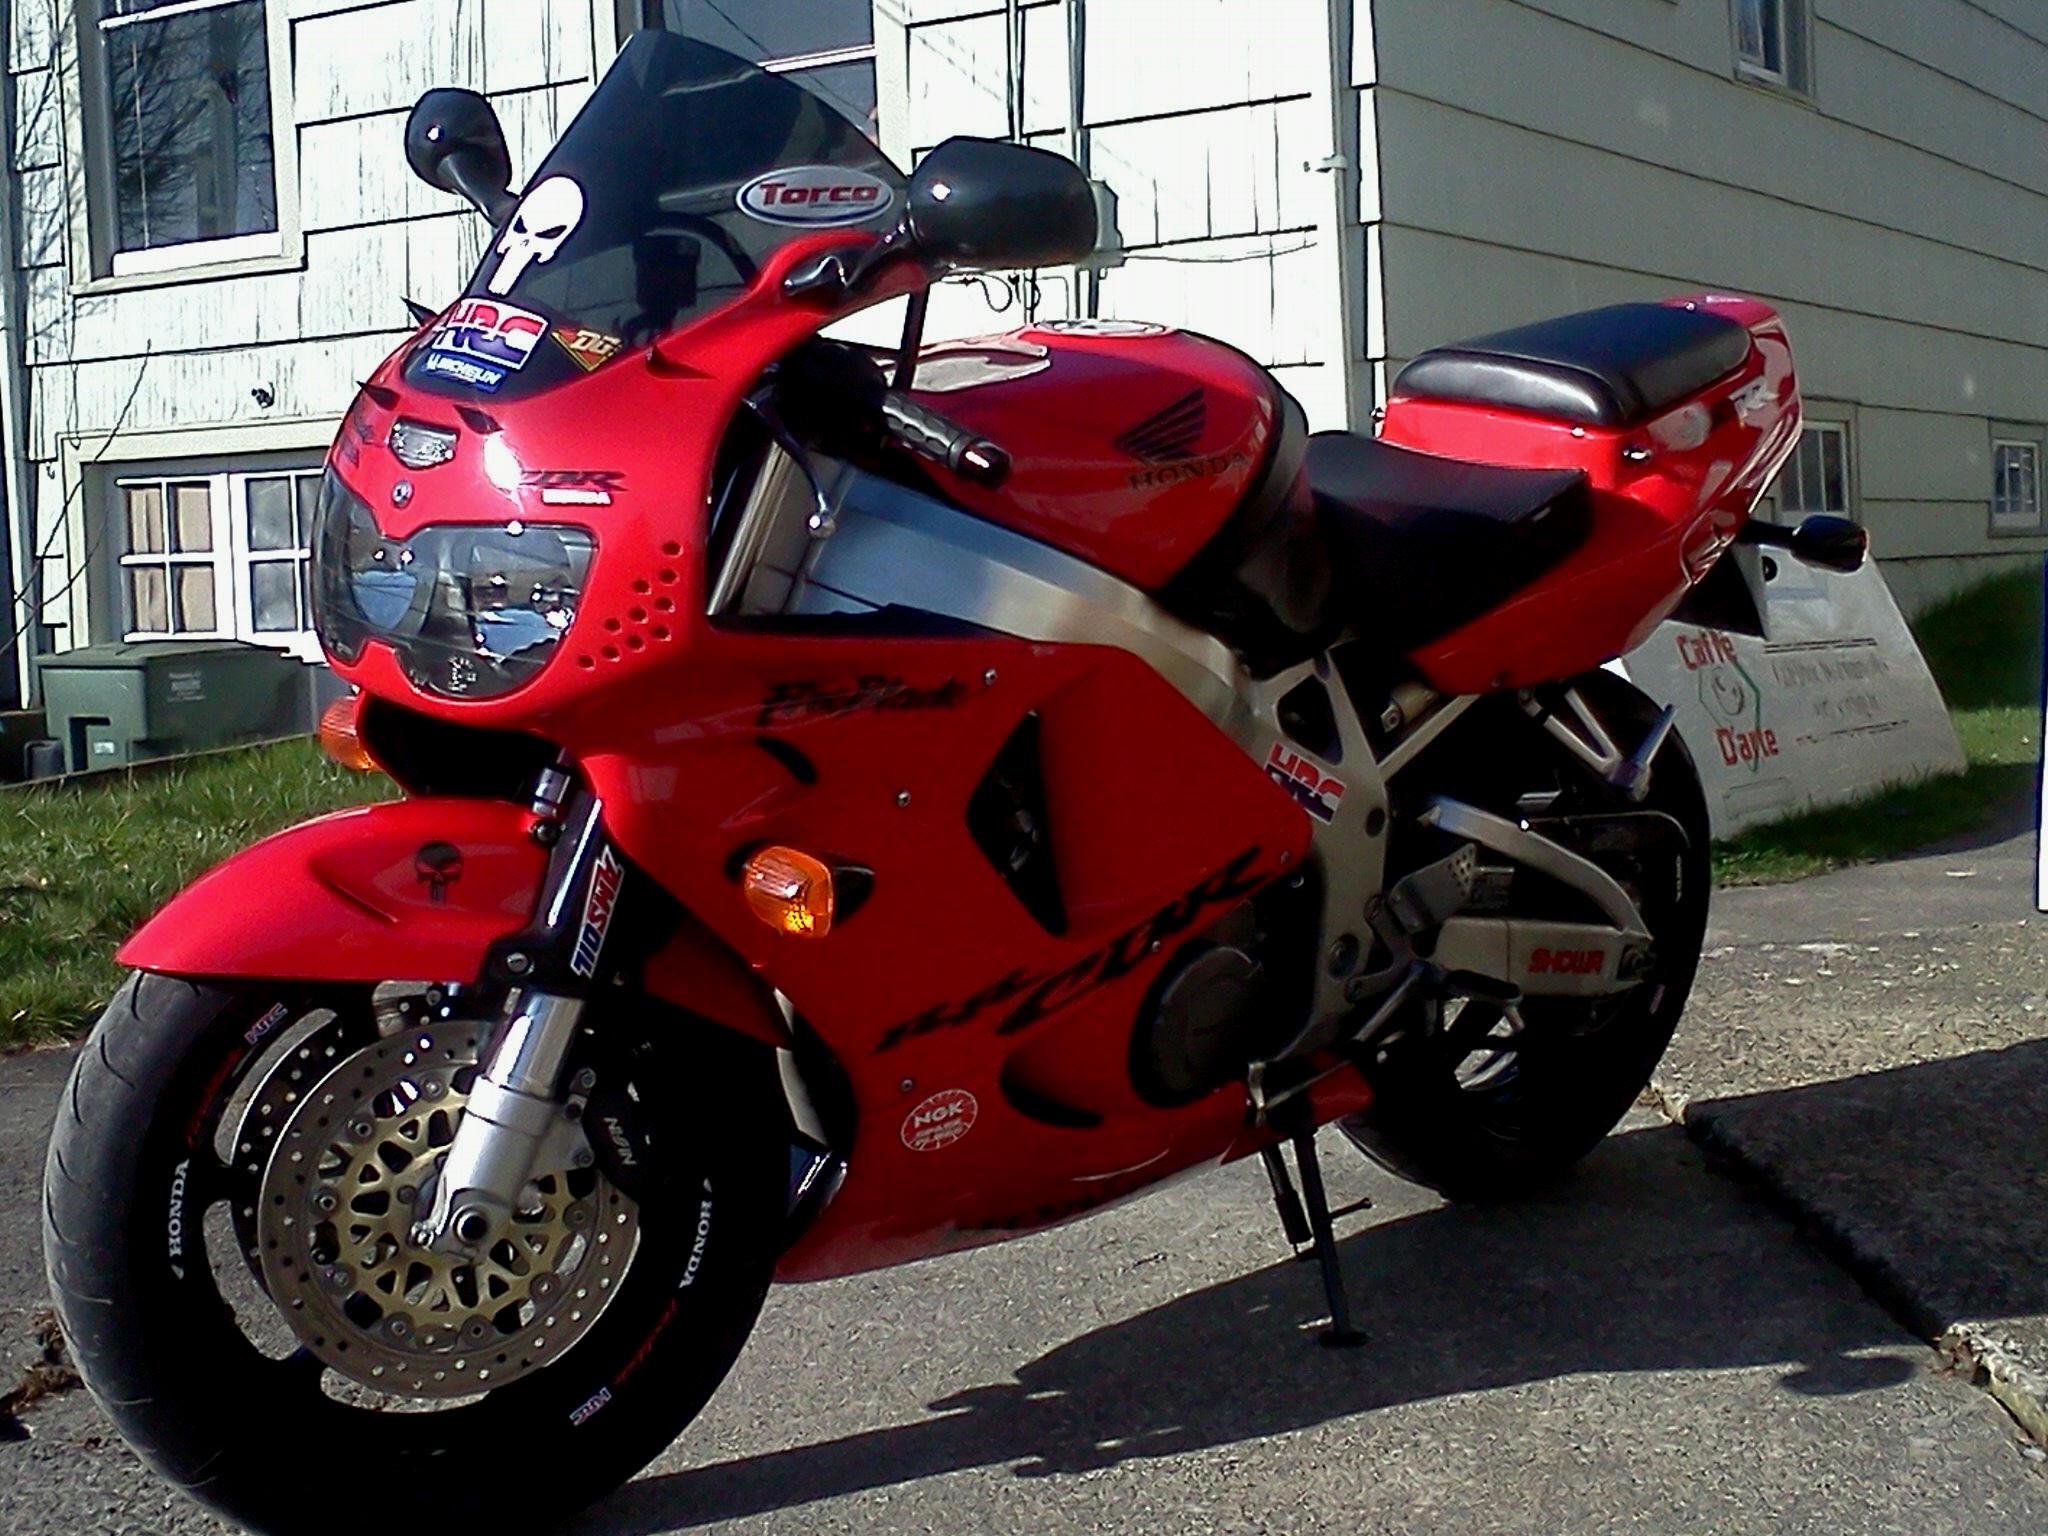 Honda Motorcycle Repair Manuals Pdf Information Goldwing Gl1800 Service Manual Youtube